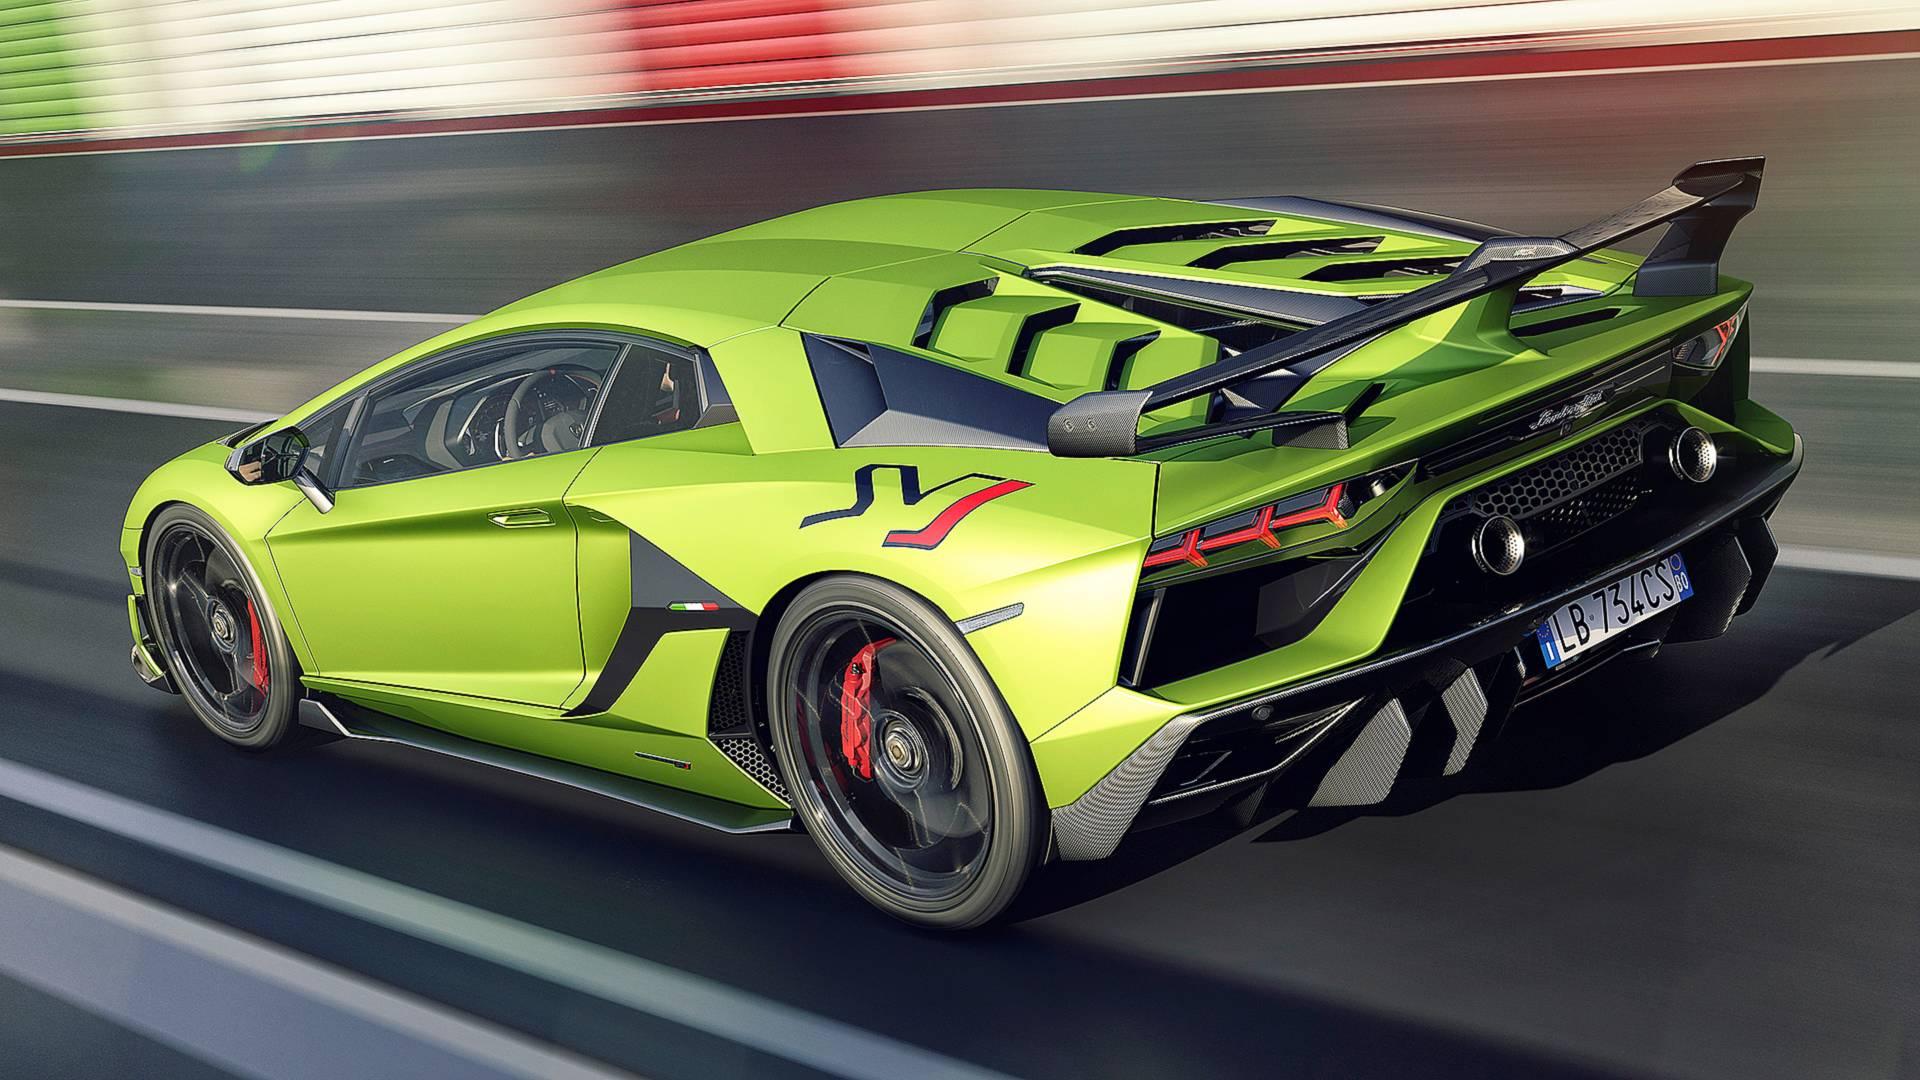 Lamborghini Aventador SVJ Looks Complicated In Live Footage